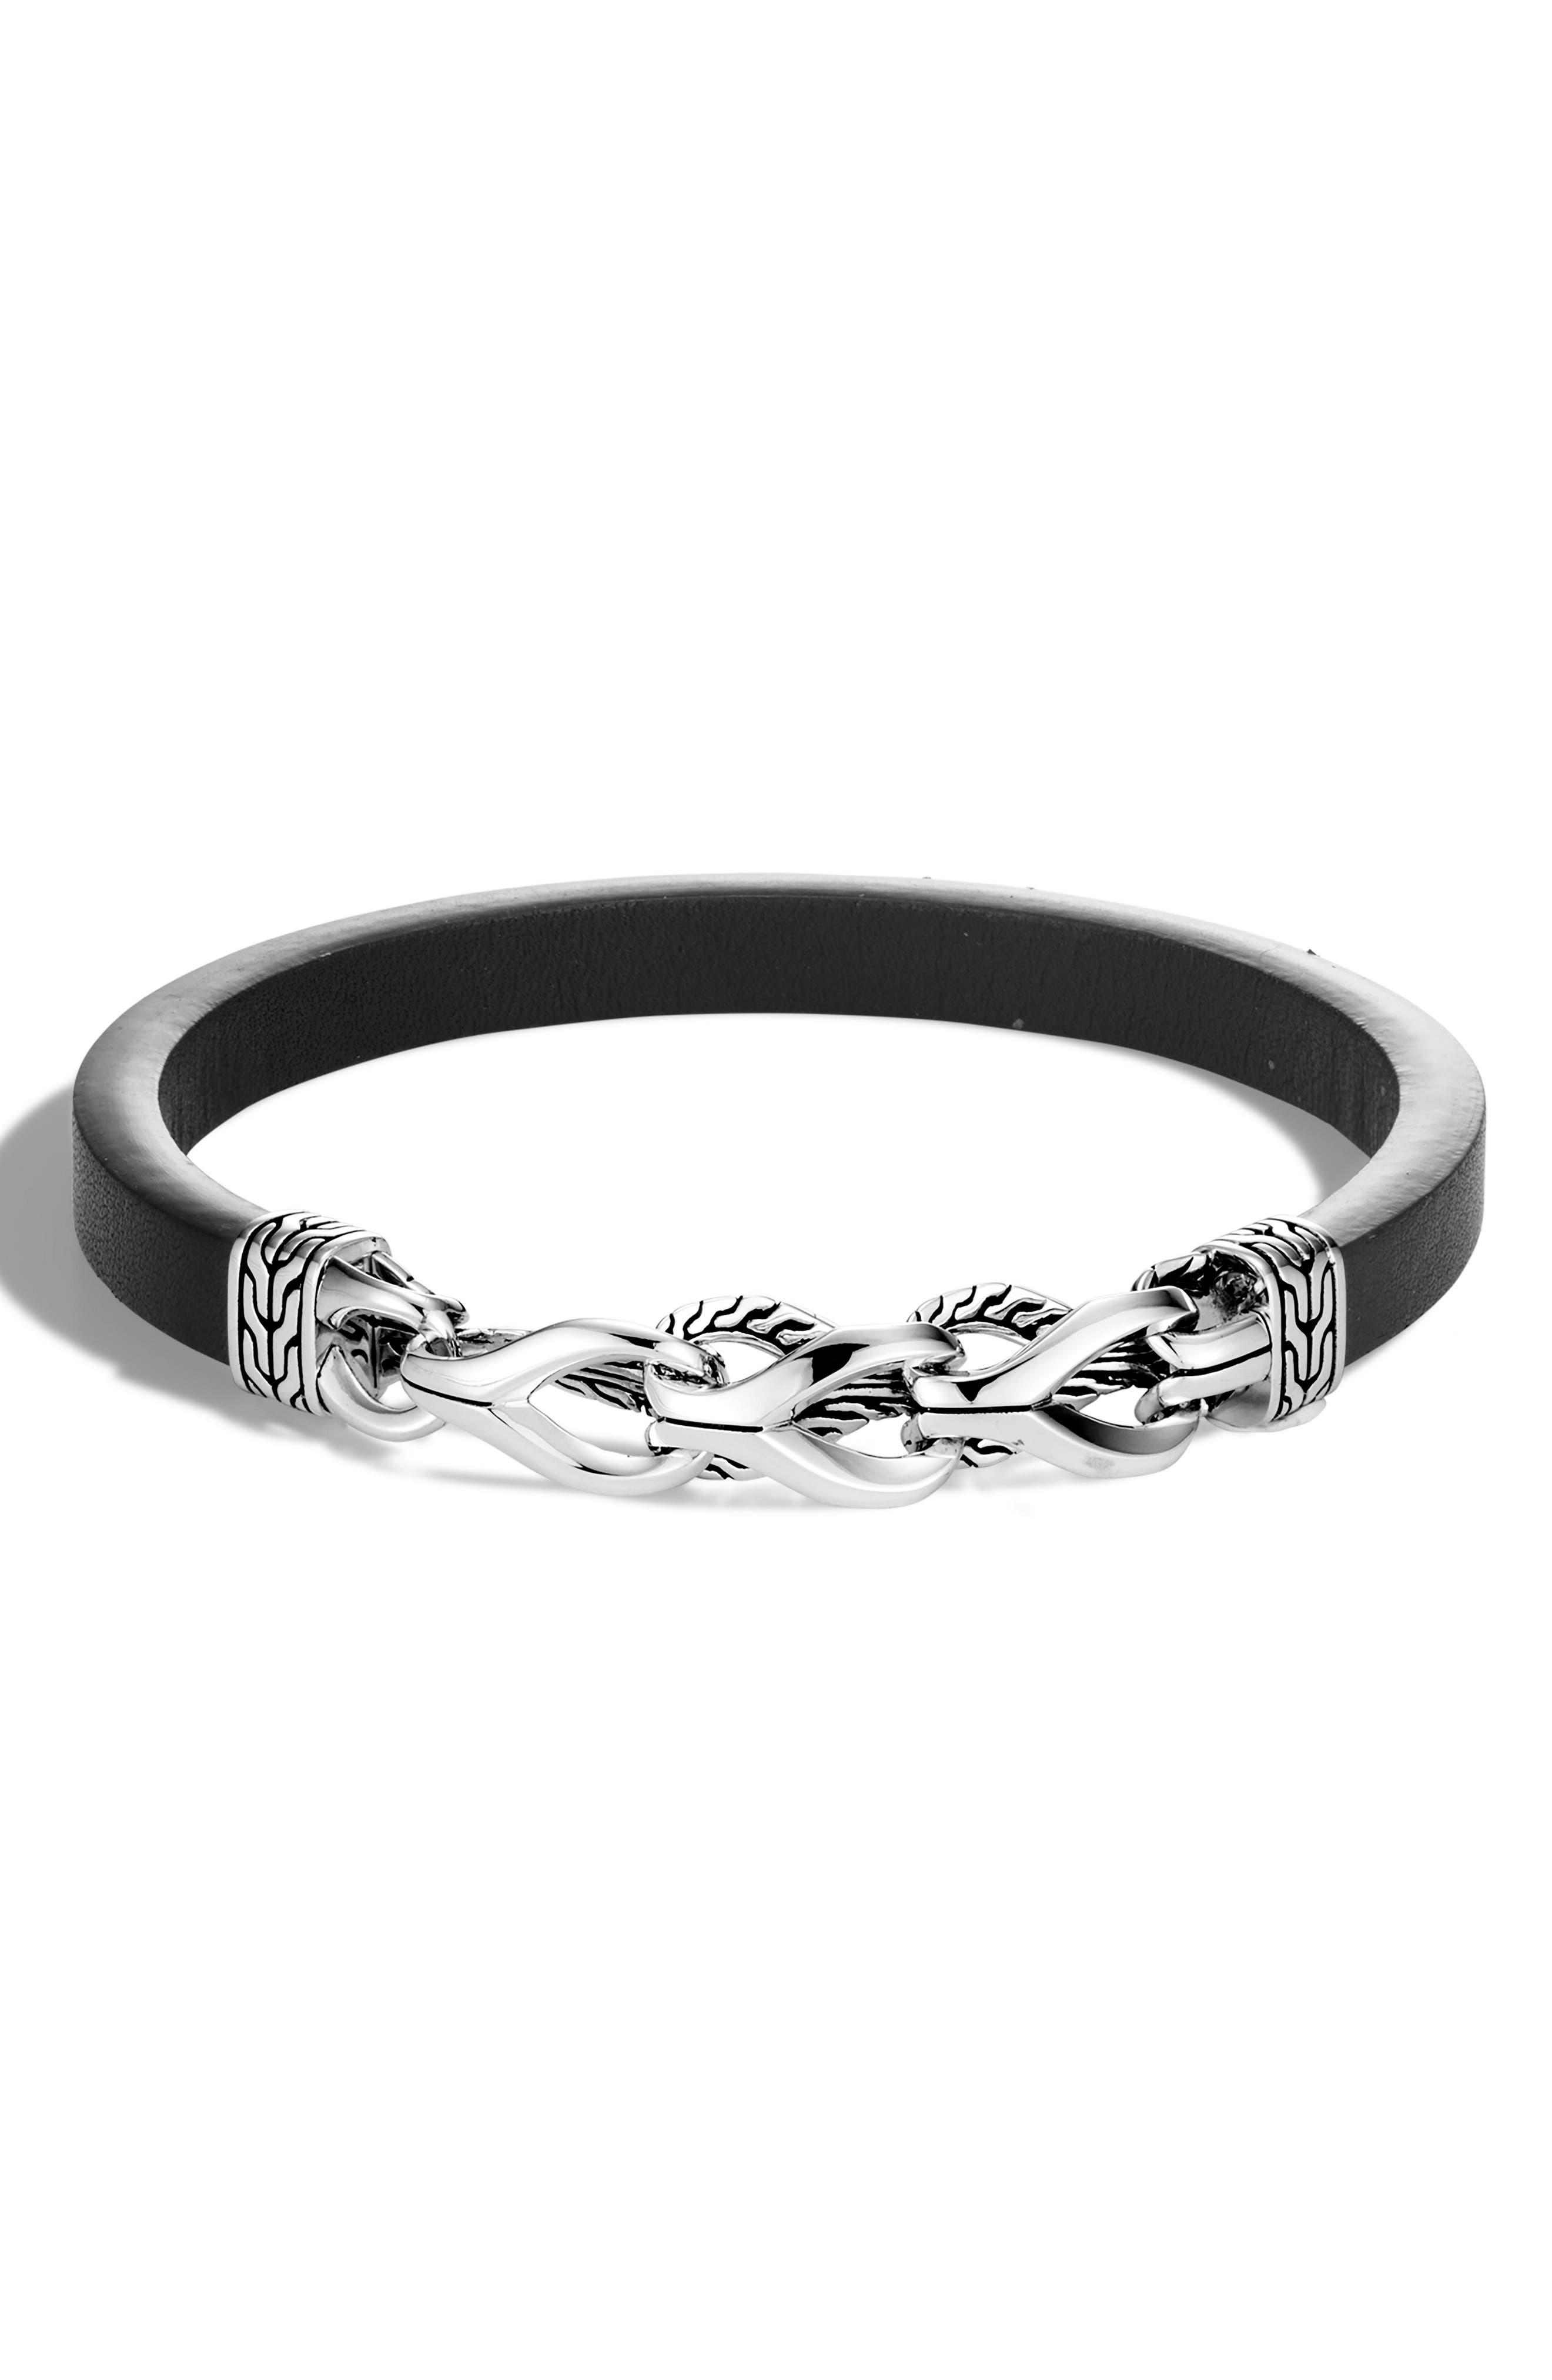 JOHN HARDY,                             Asli Classic Chain Link Bracelet,                             Main thumbnail 1, color,                             SILVER/ LEATHER